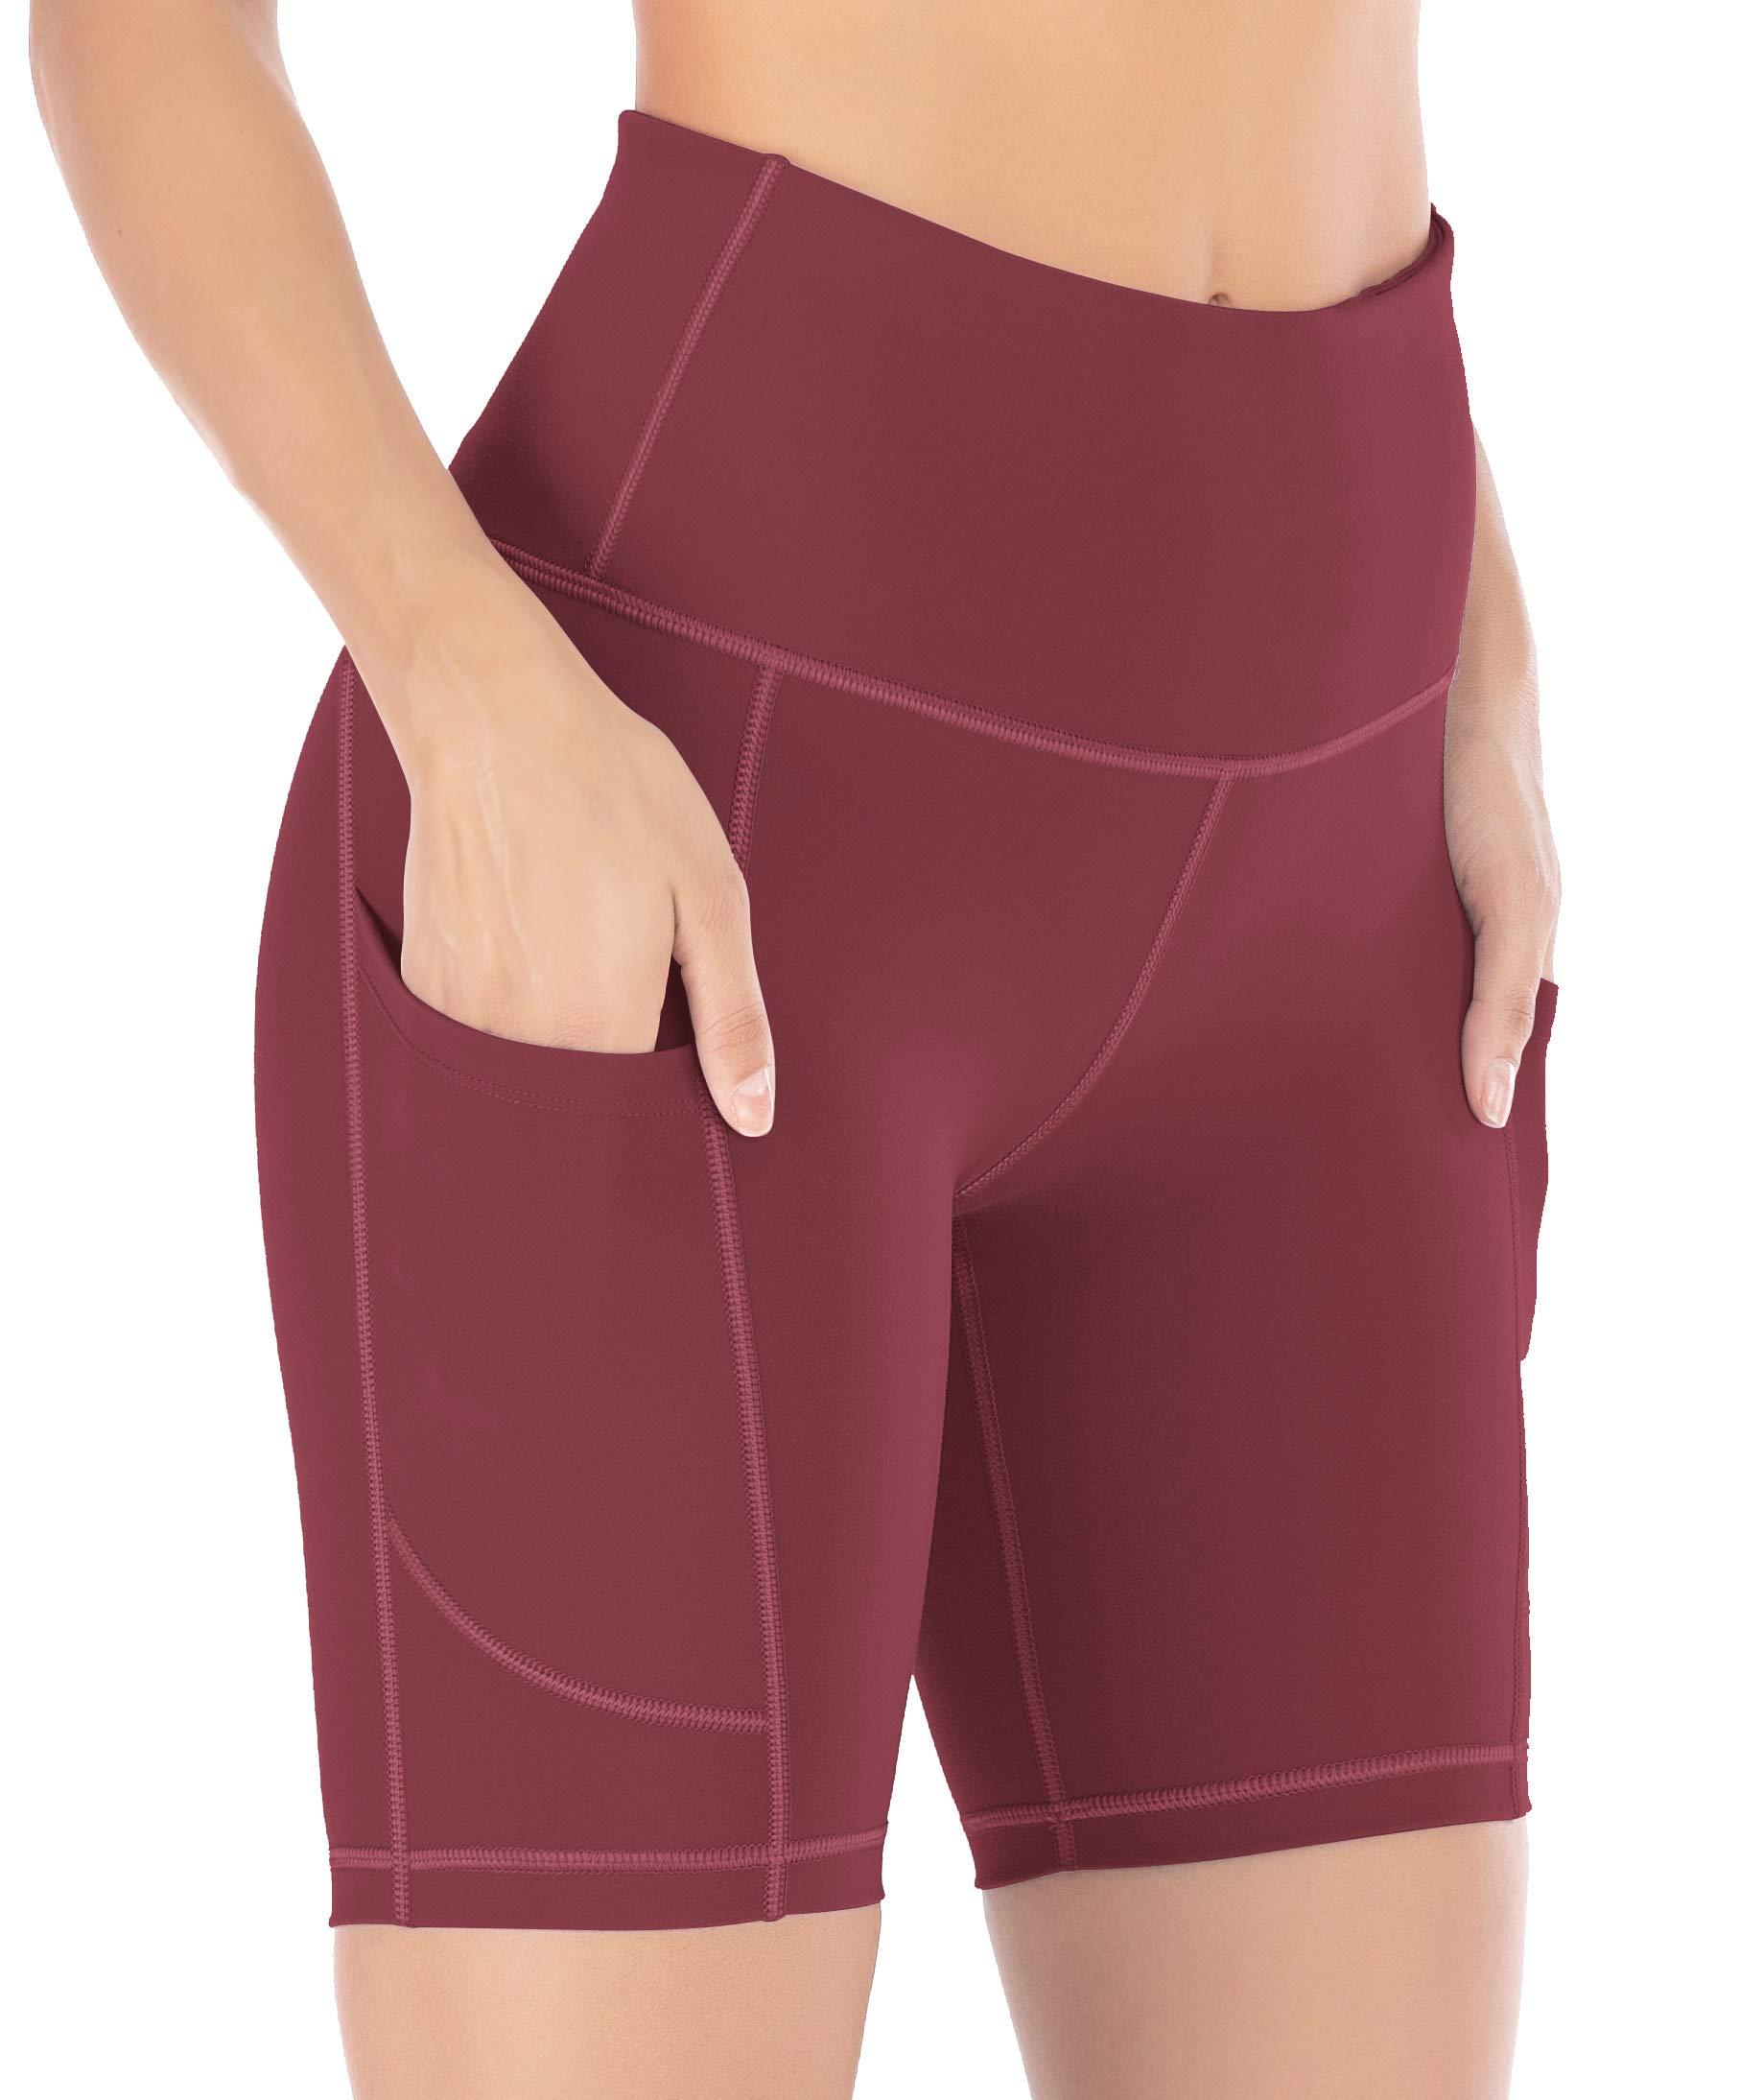 IUGA Yoga Shorts for Women Workout Shorts Tummy Control Running Shorts with Side Pockets Maroon by IUGA